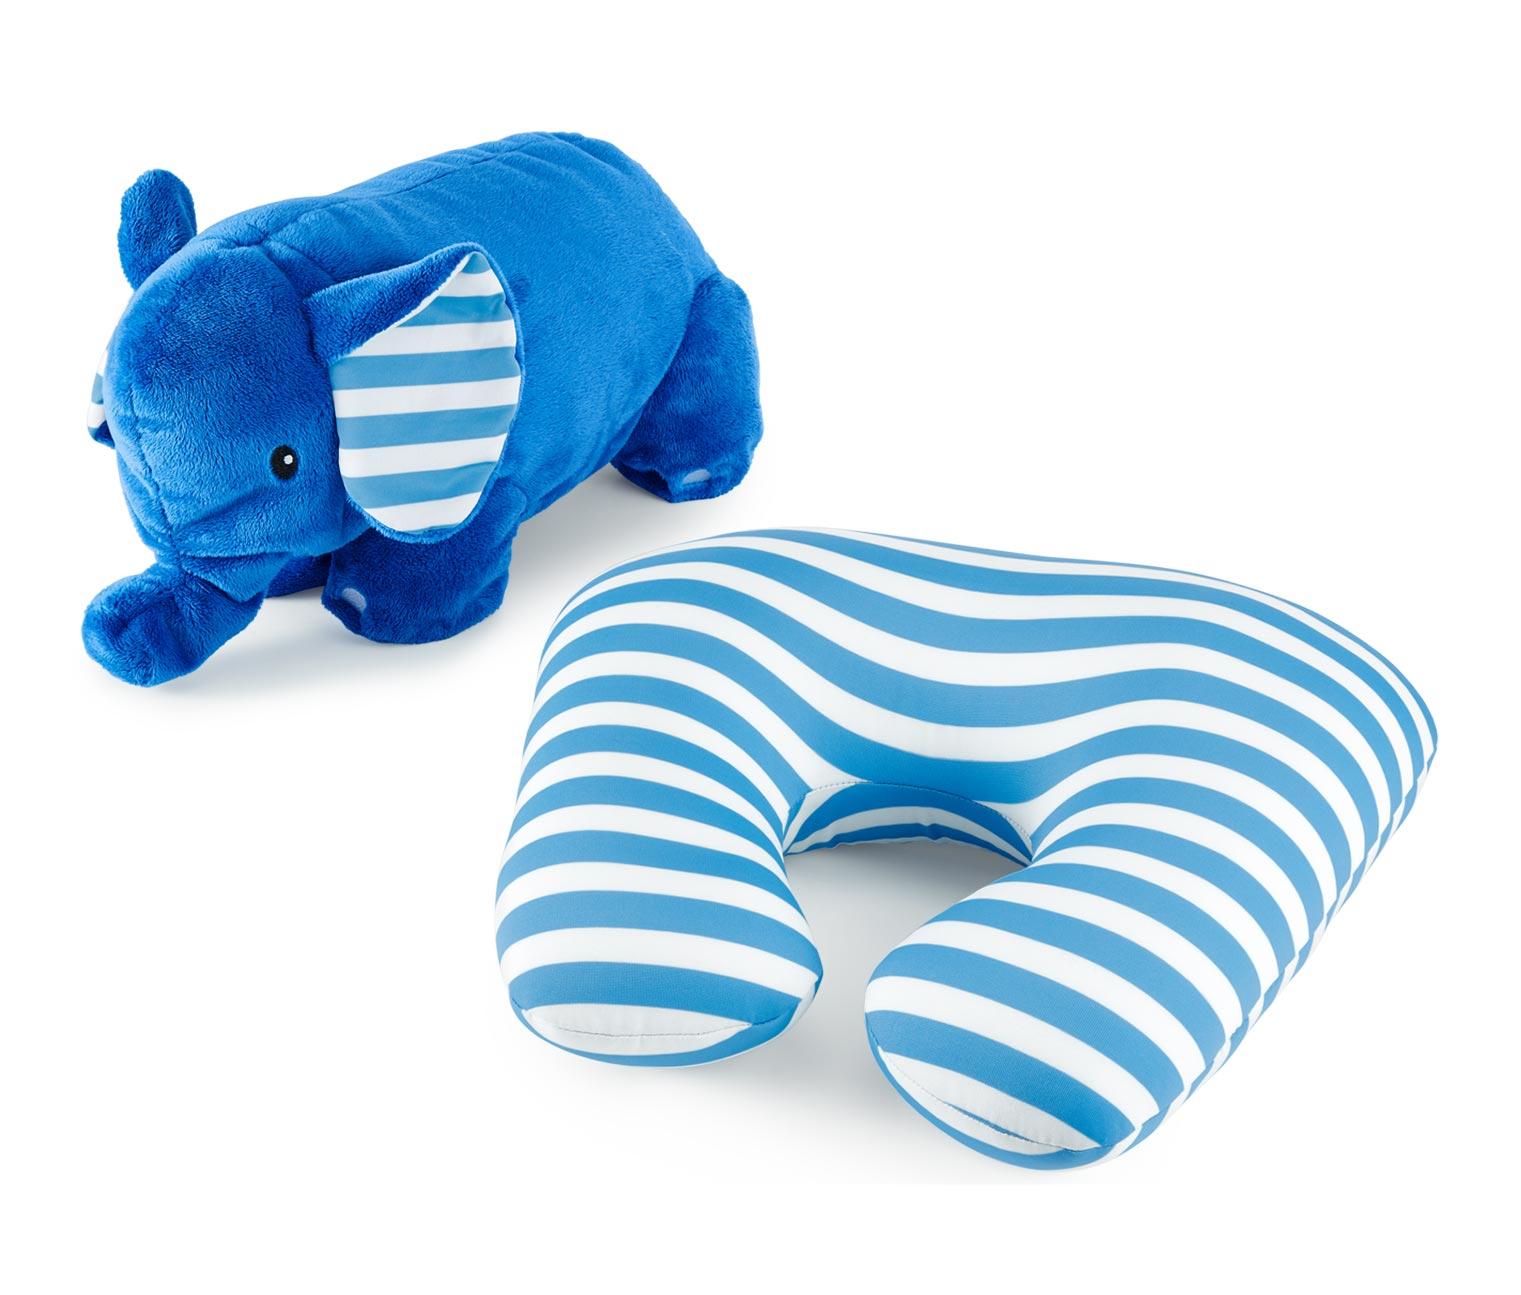 Elefanten Nackenkissen in blau